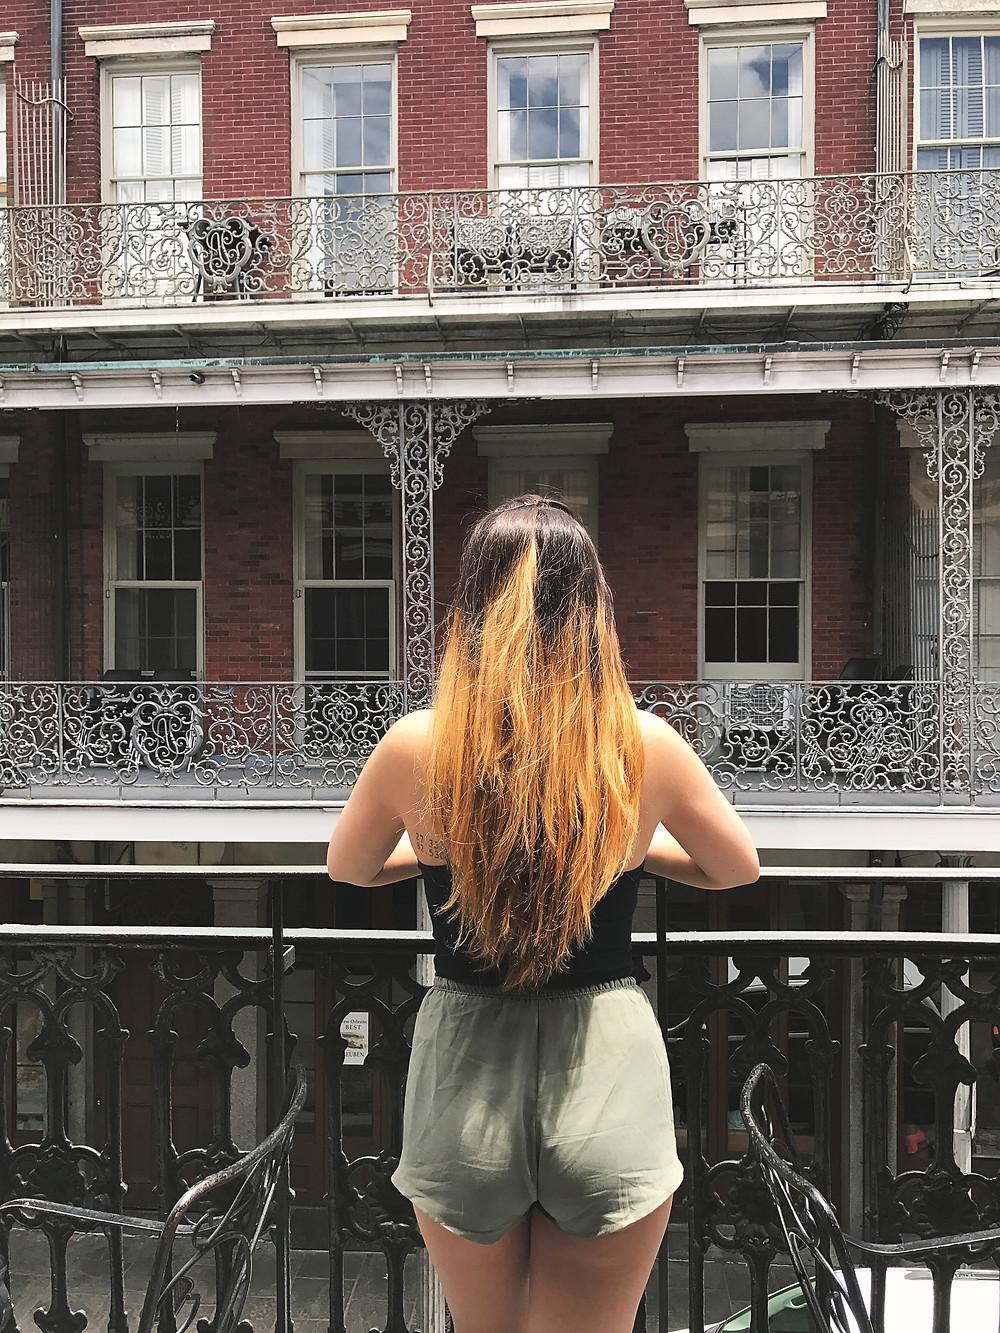 Balcony at Muriel's Jackson Square I New Orleans Travel Guide I Nicole Riccardo